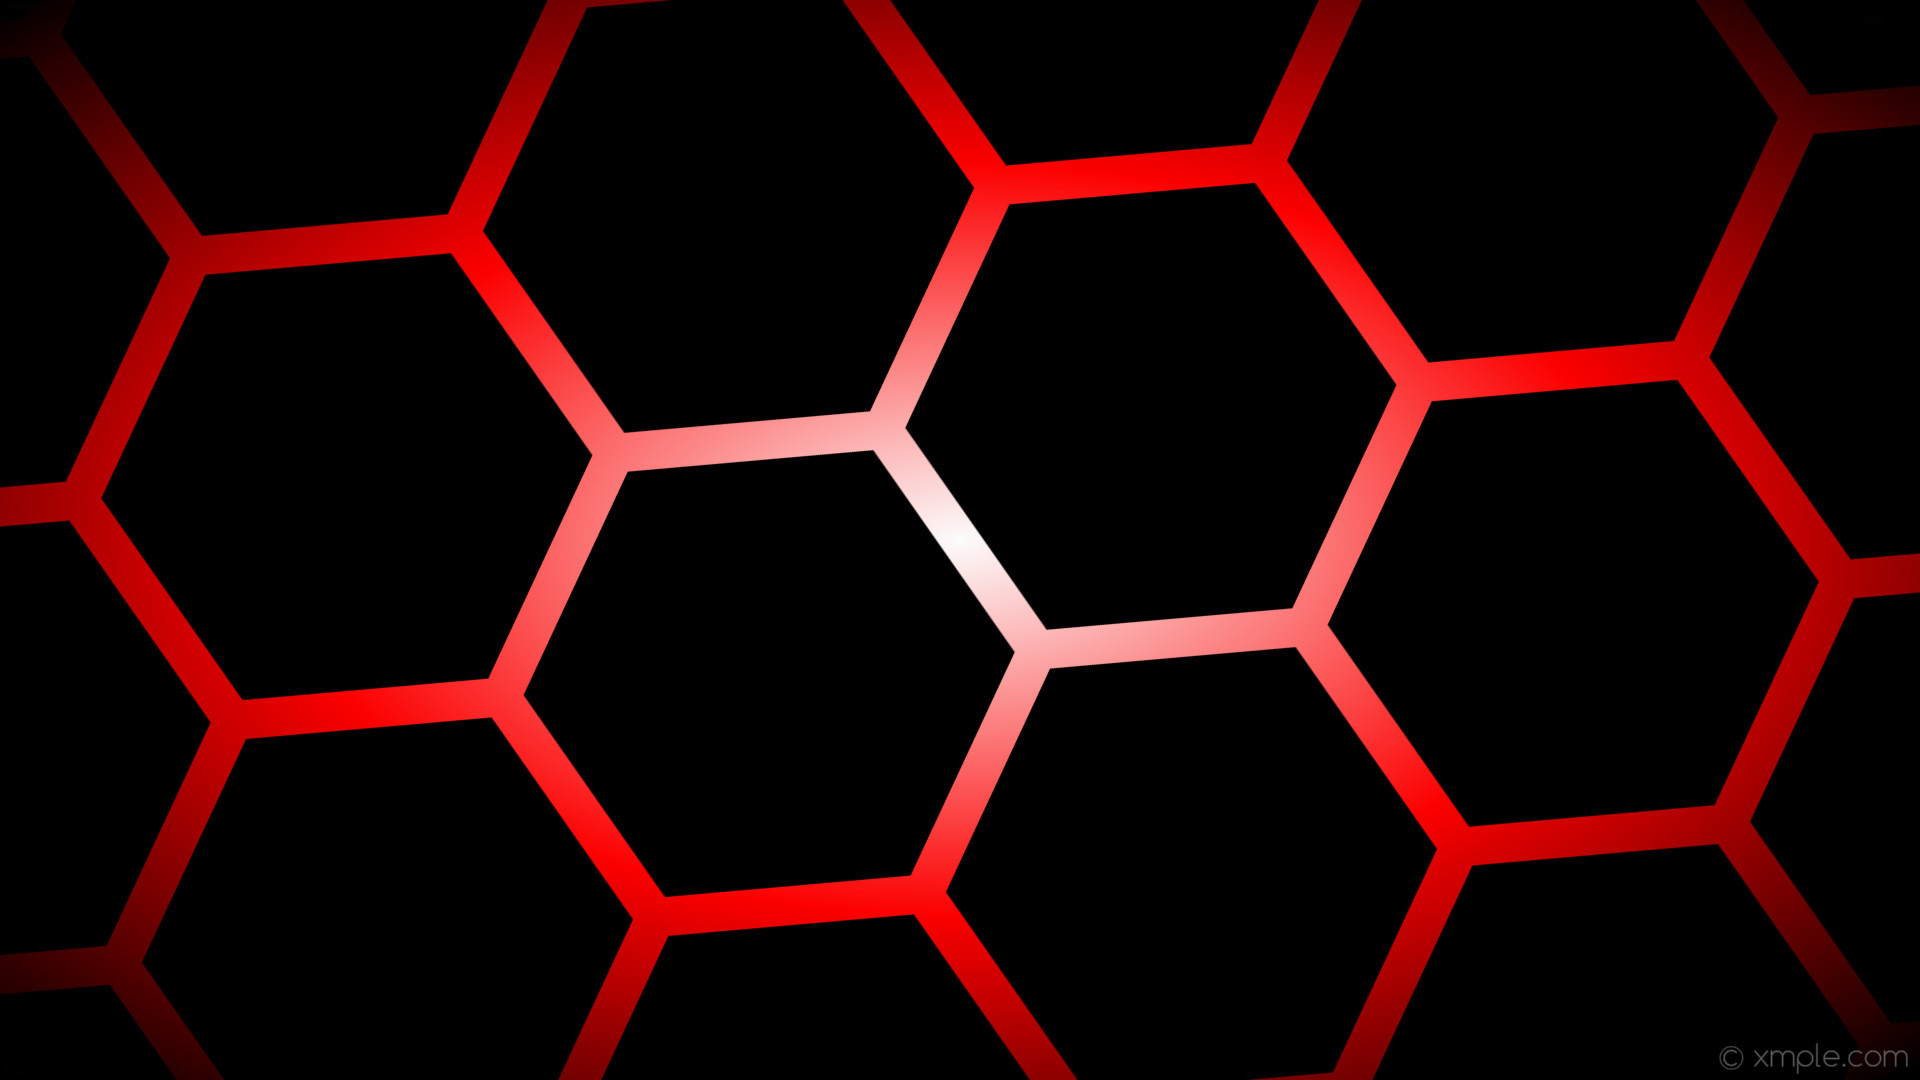 wallpaper black glow hexagon white gradient red #000000 #ffffff #ff0000  diagonal 35°